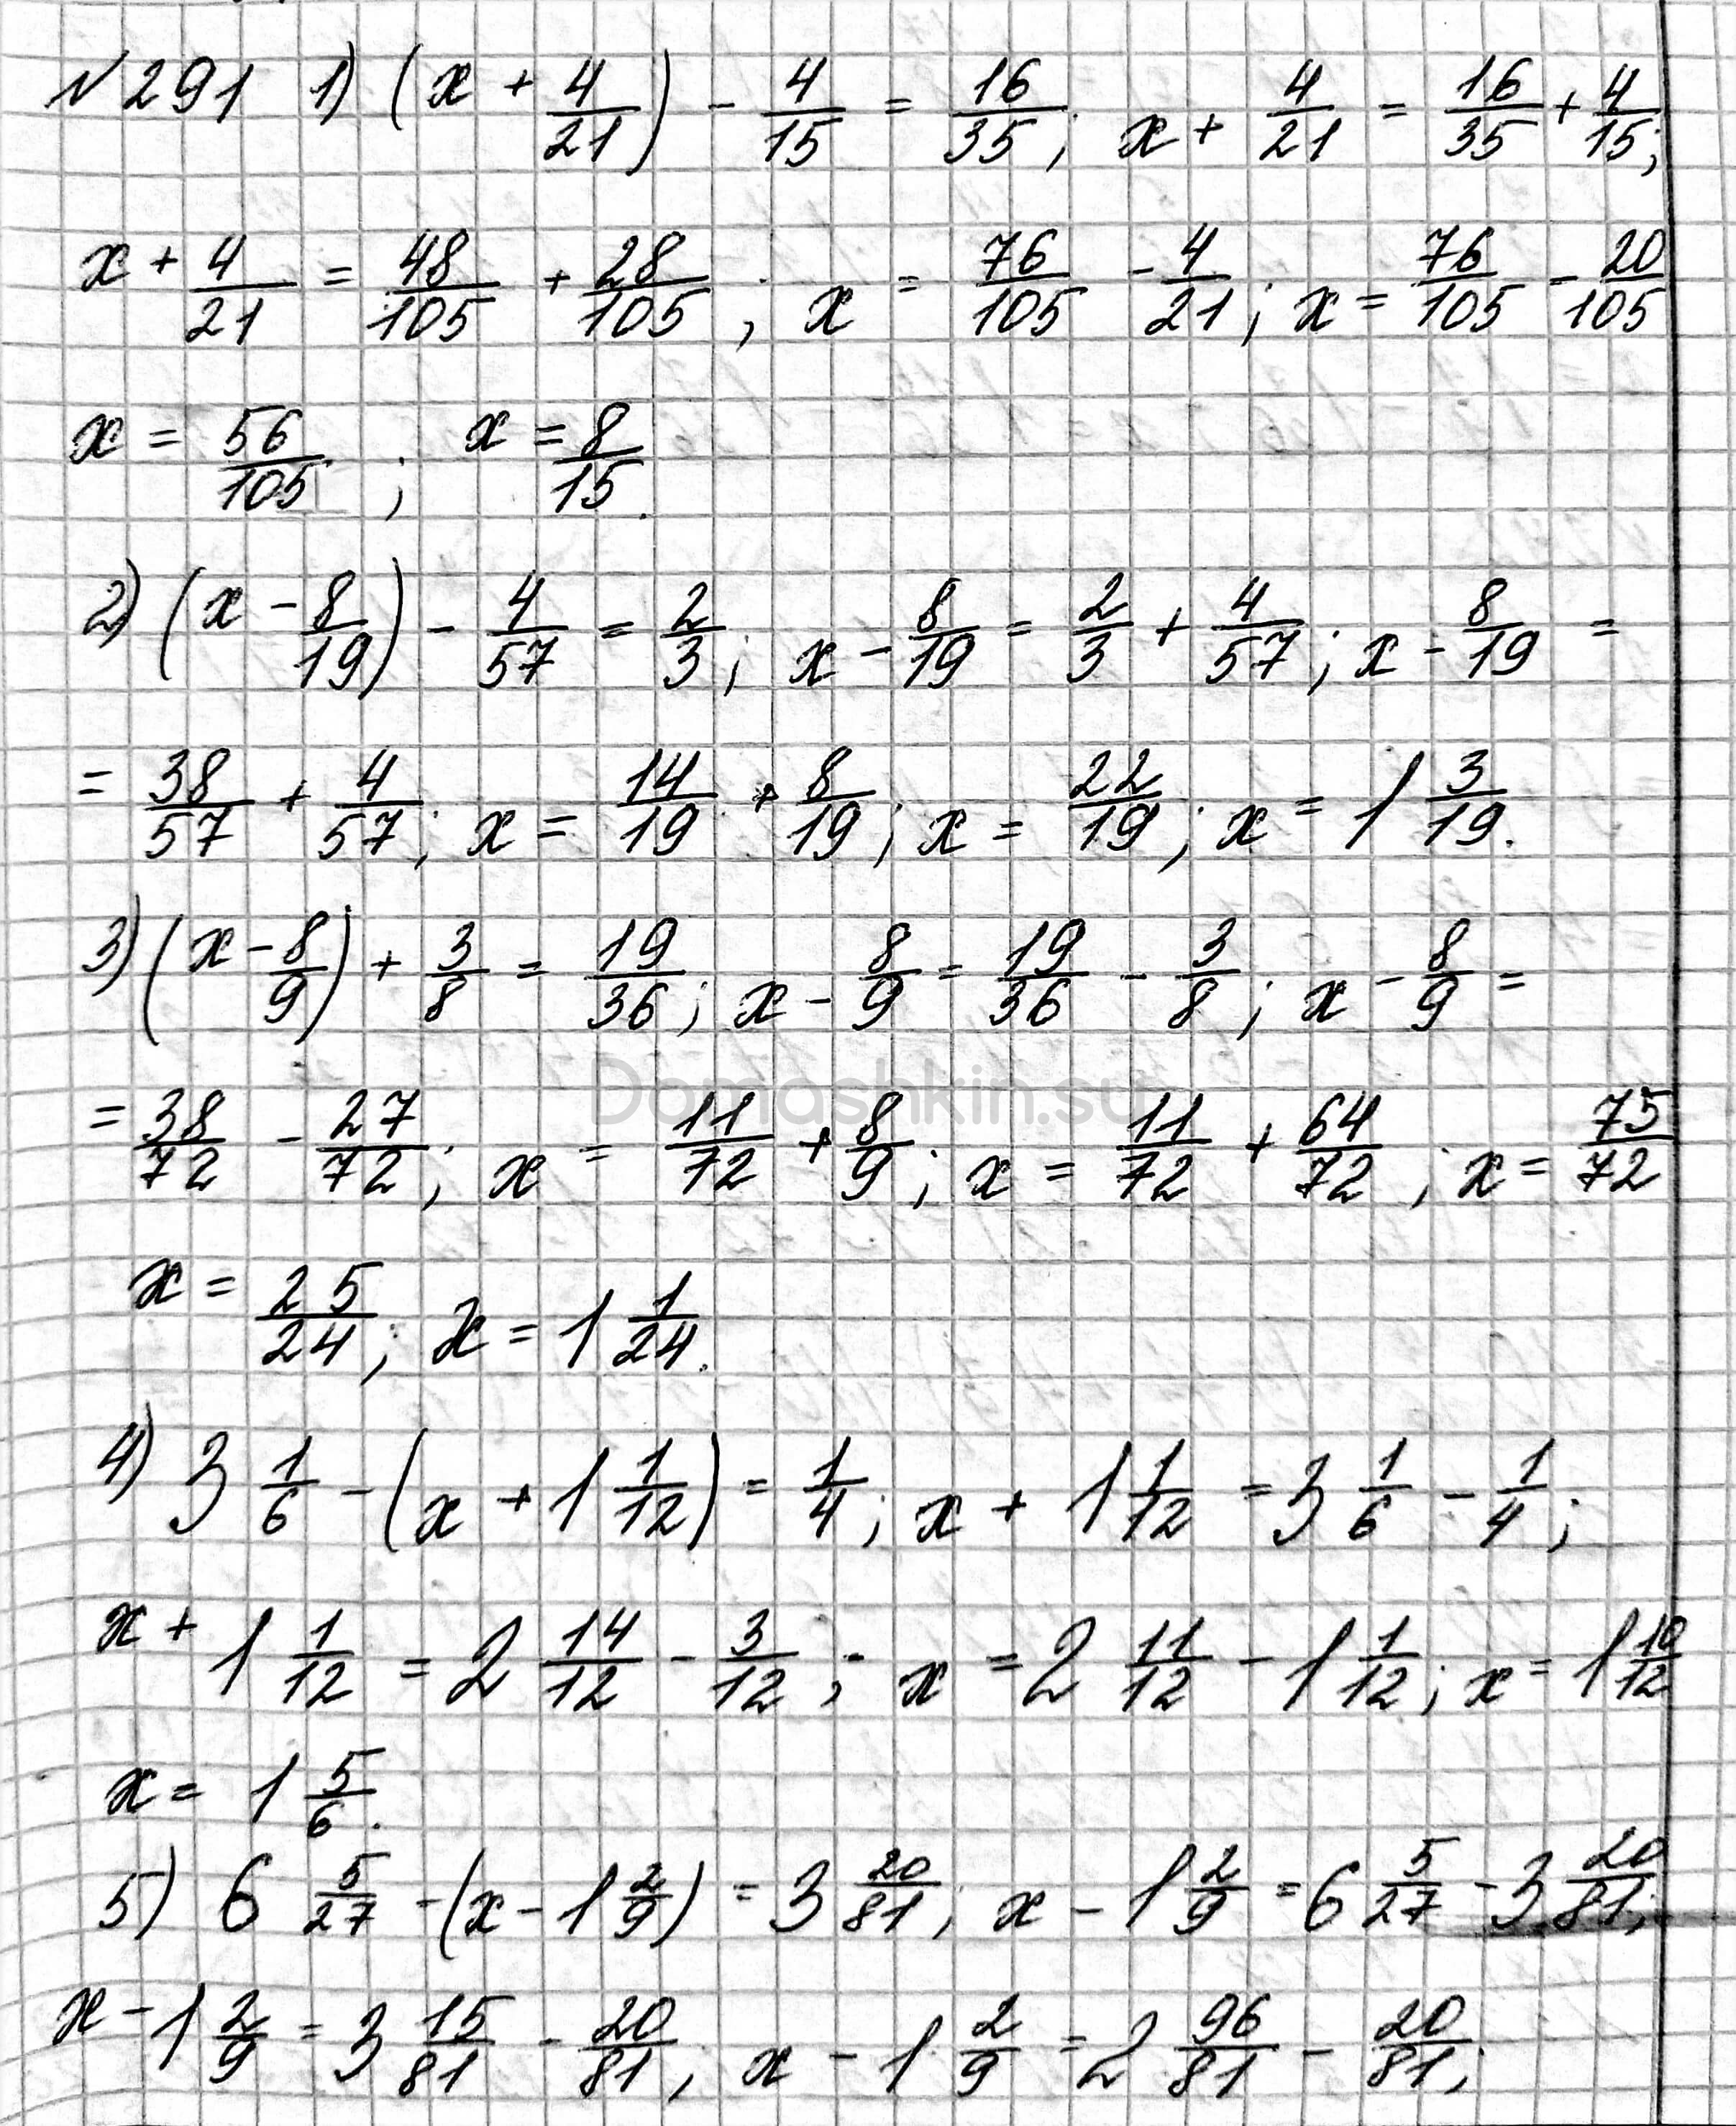 Математика 6 класс учебник Мерзляк номер 291 решение